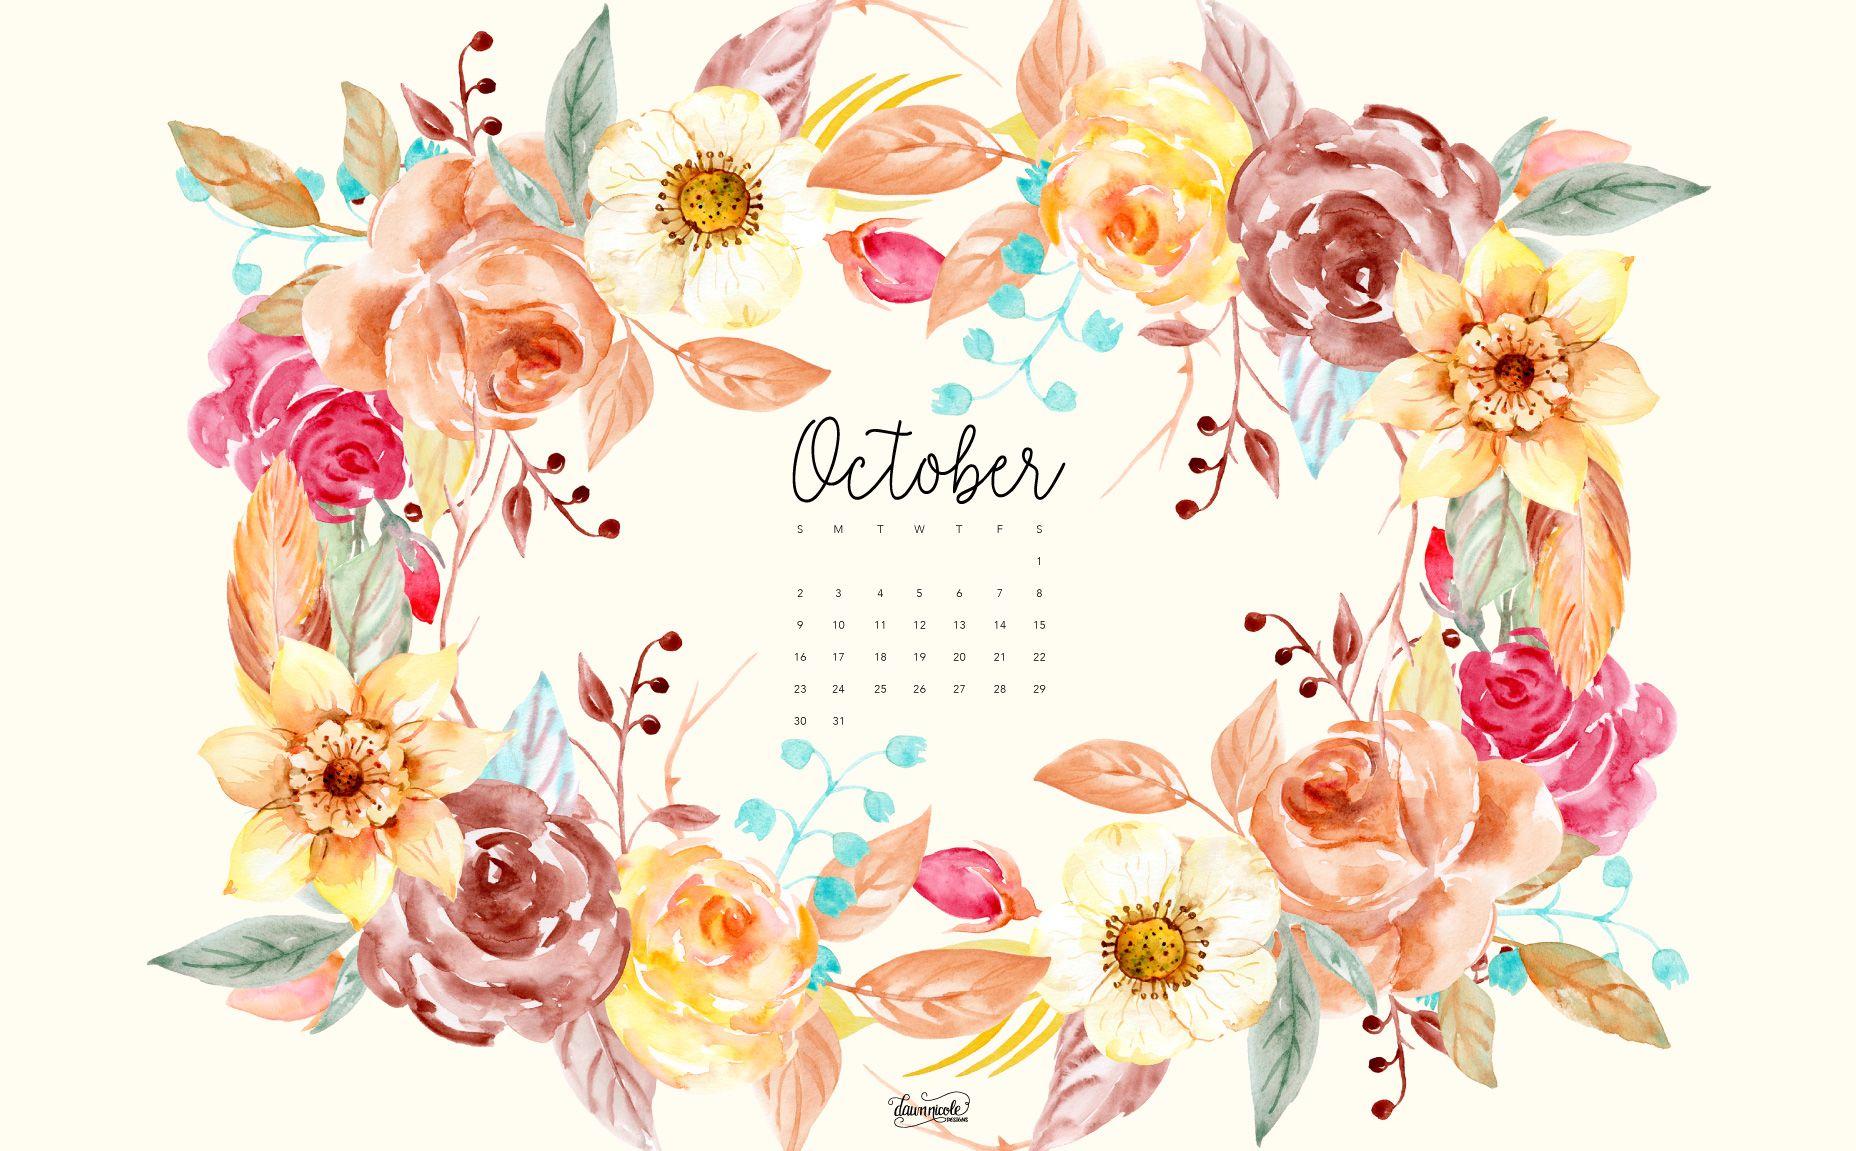 October 2016 Calendar + Tech Pretties October wallpaper